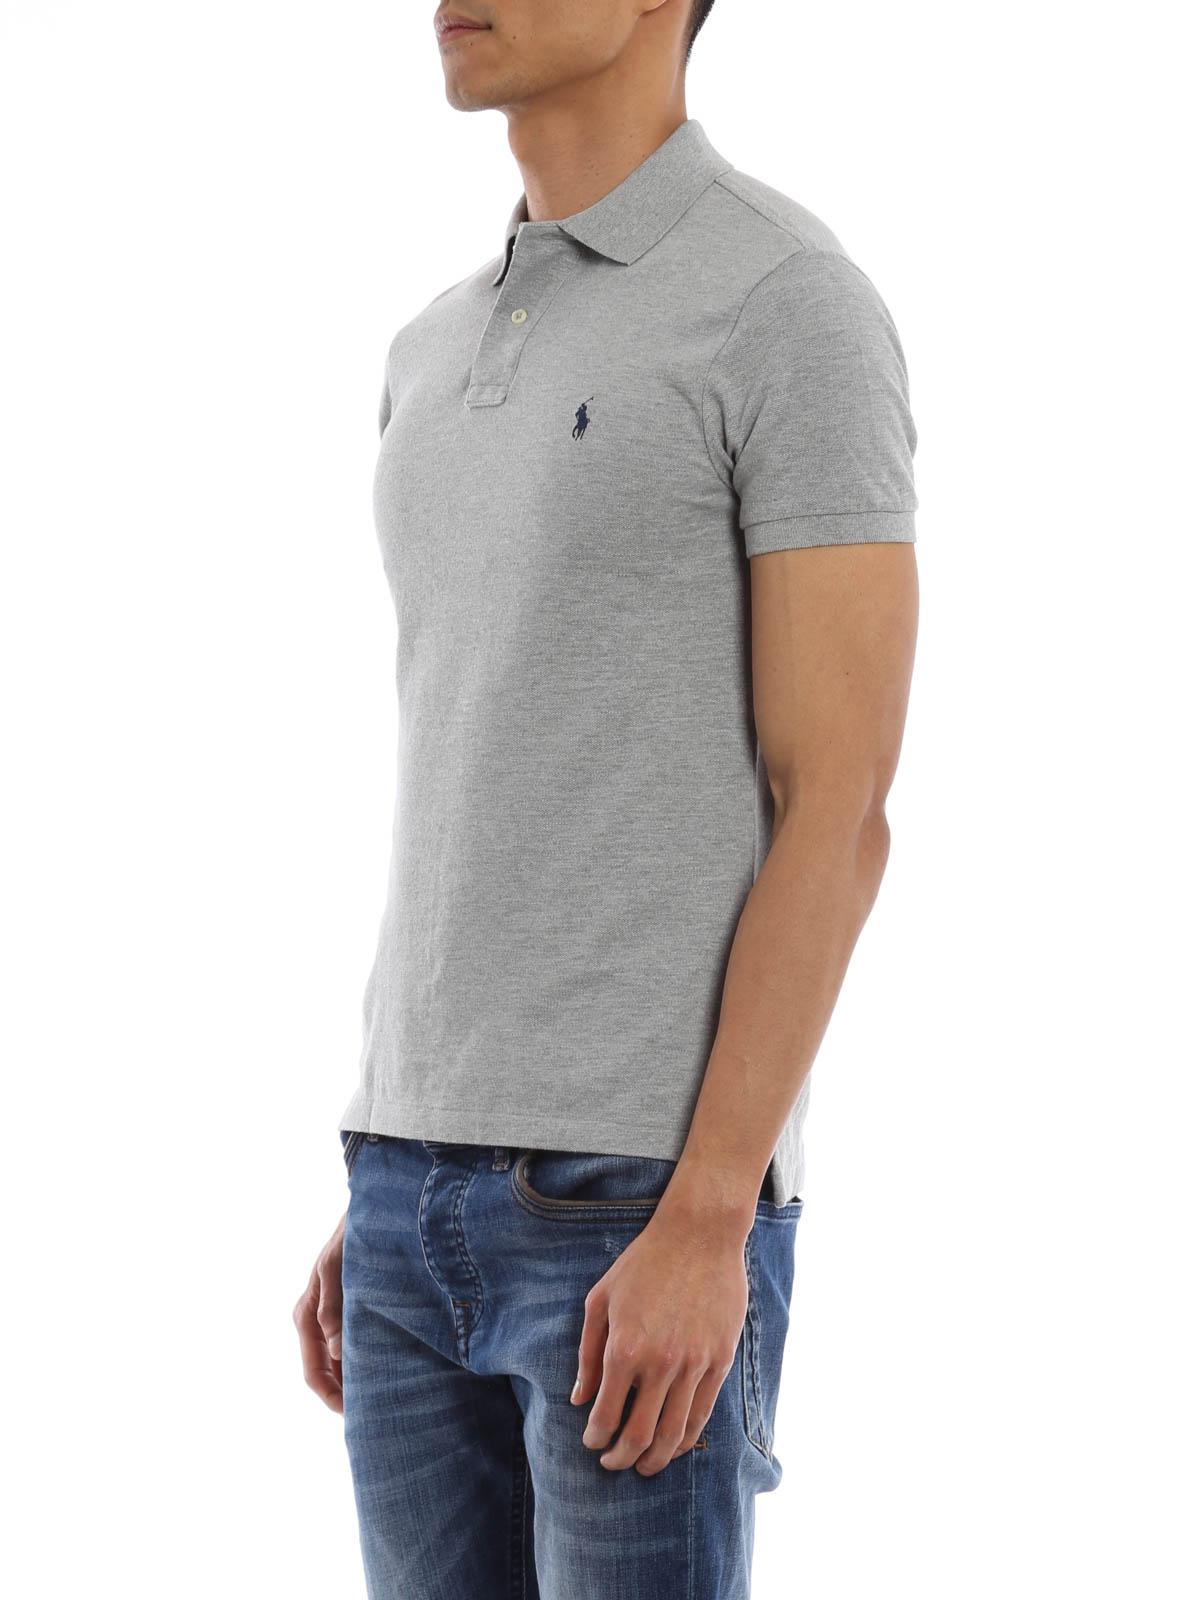 cotton pique polo shirt by polo ralph lauren polo shirts. Black Bedroom Furniture Sets. Home Design Ideas